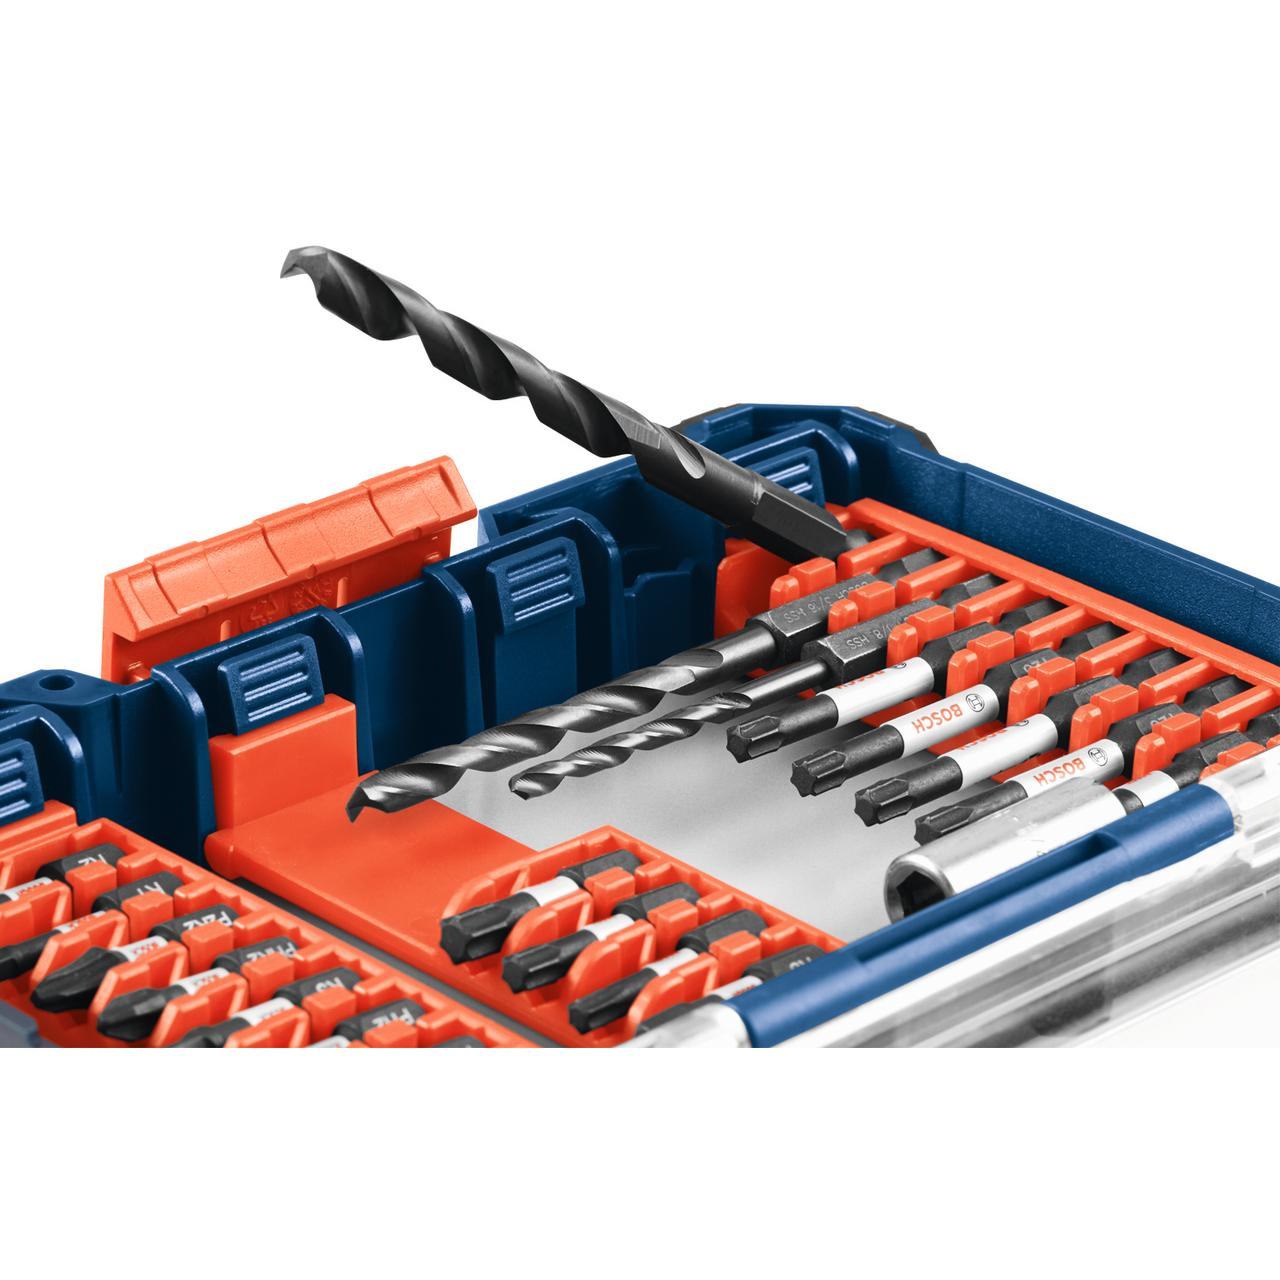 bosch ddms40 40-piece impact tough drill/drive custom case set